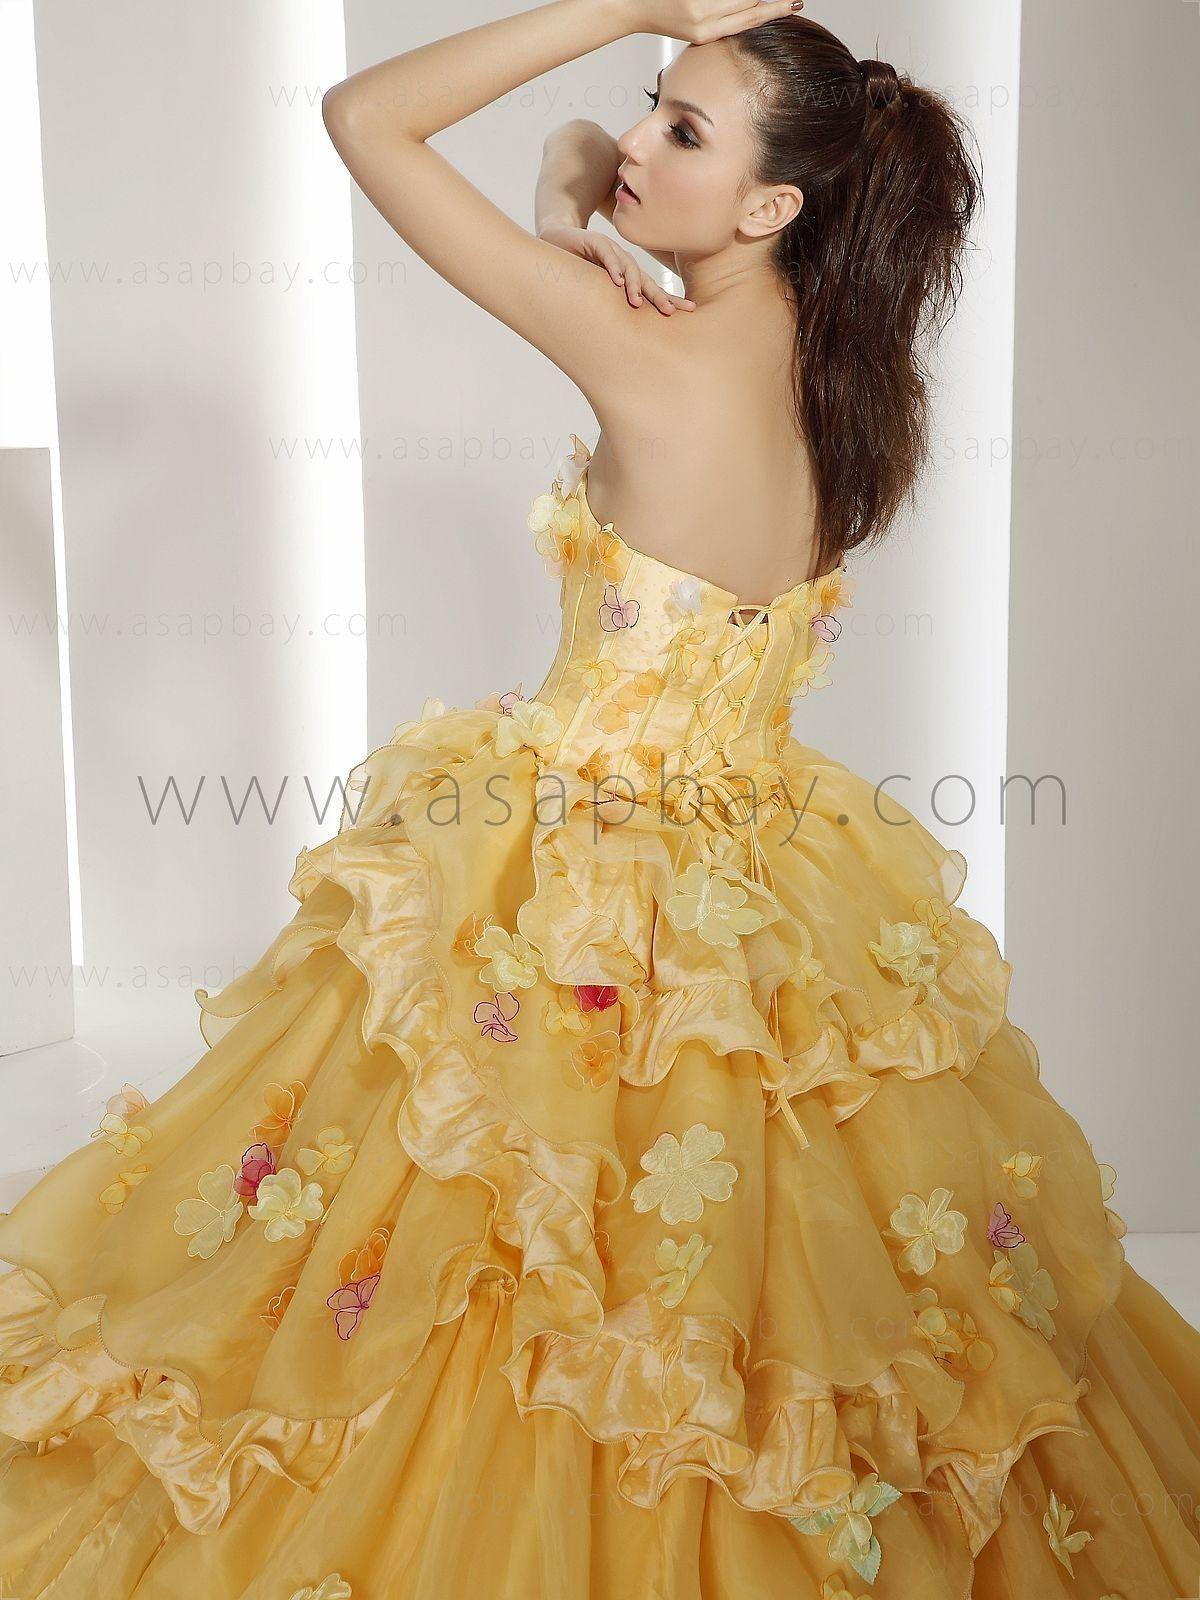 Yellow chapel train organza strapless ball gown wedding dress